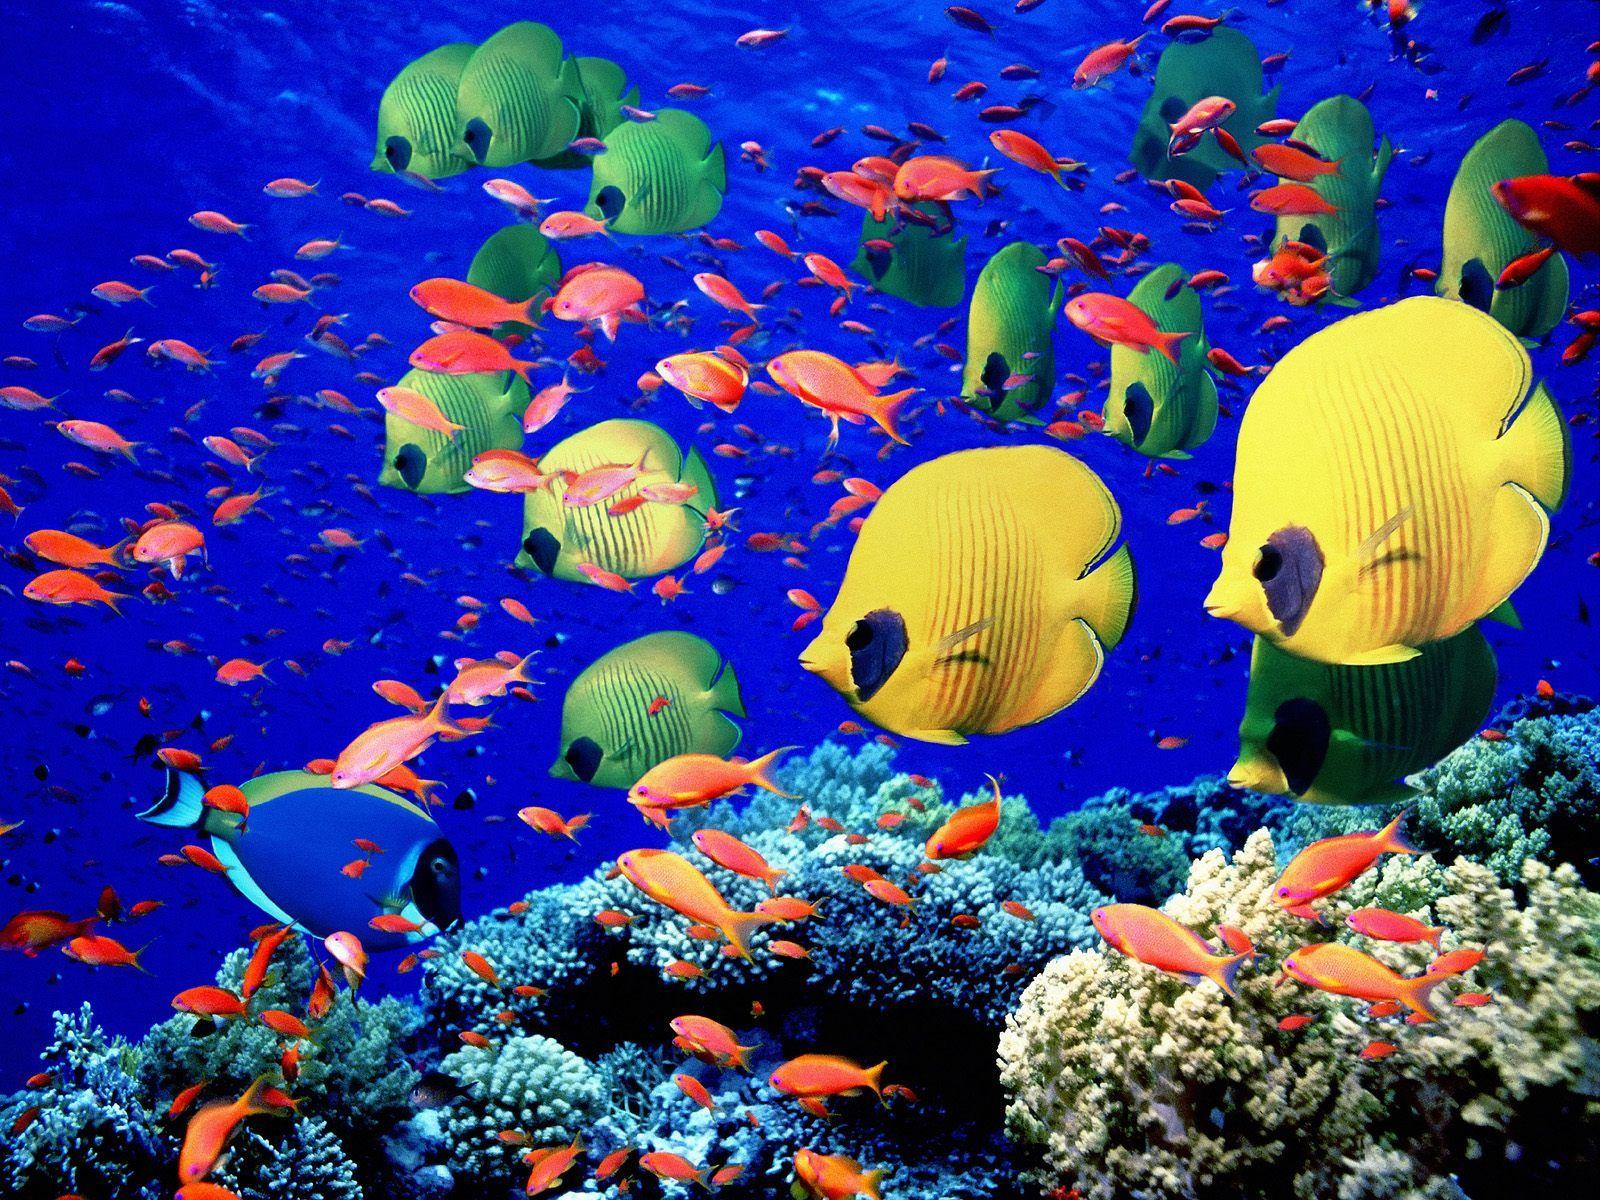 Fish aquarium live wallpaper for pc - Free Live Aquarium Wallpaper Desktop Wallpapers